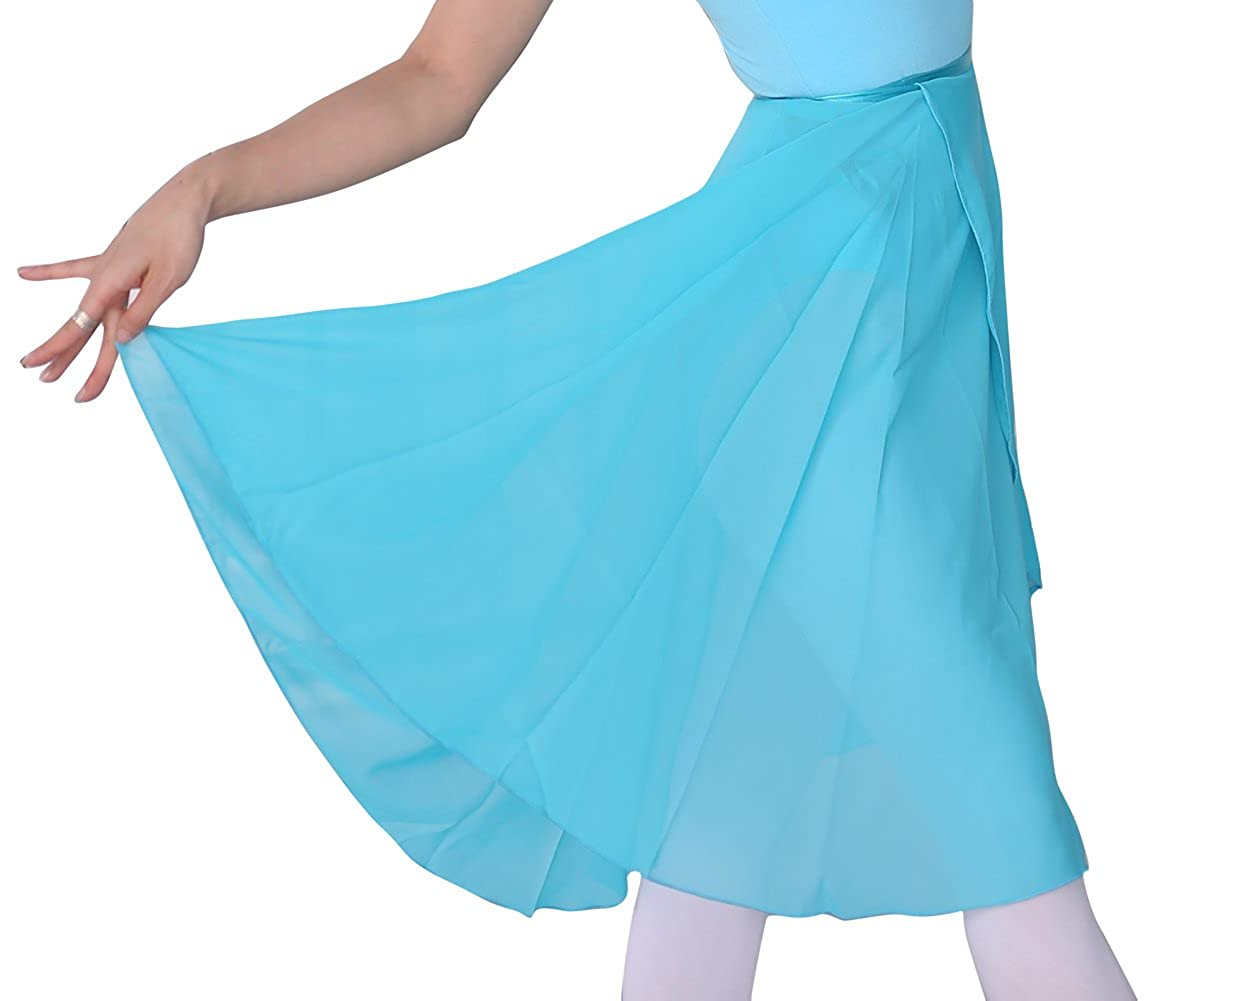 woosun Adult Ladies Ballet Leotard Tutu Skirt Women Dance Wrap Over Scarf 60cm Length Skirt Chiffon